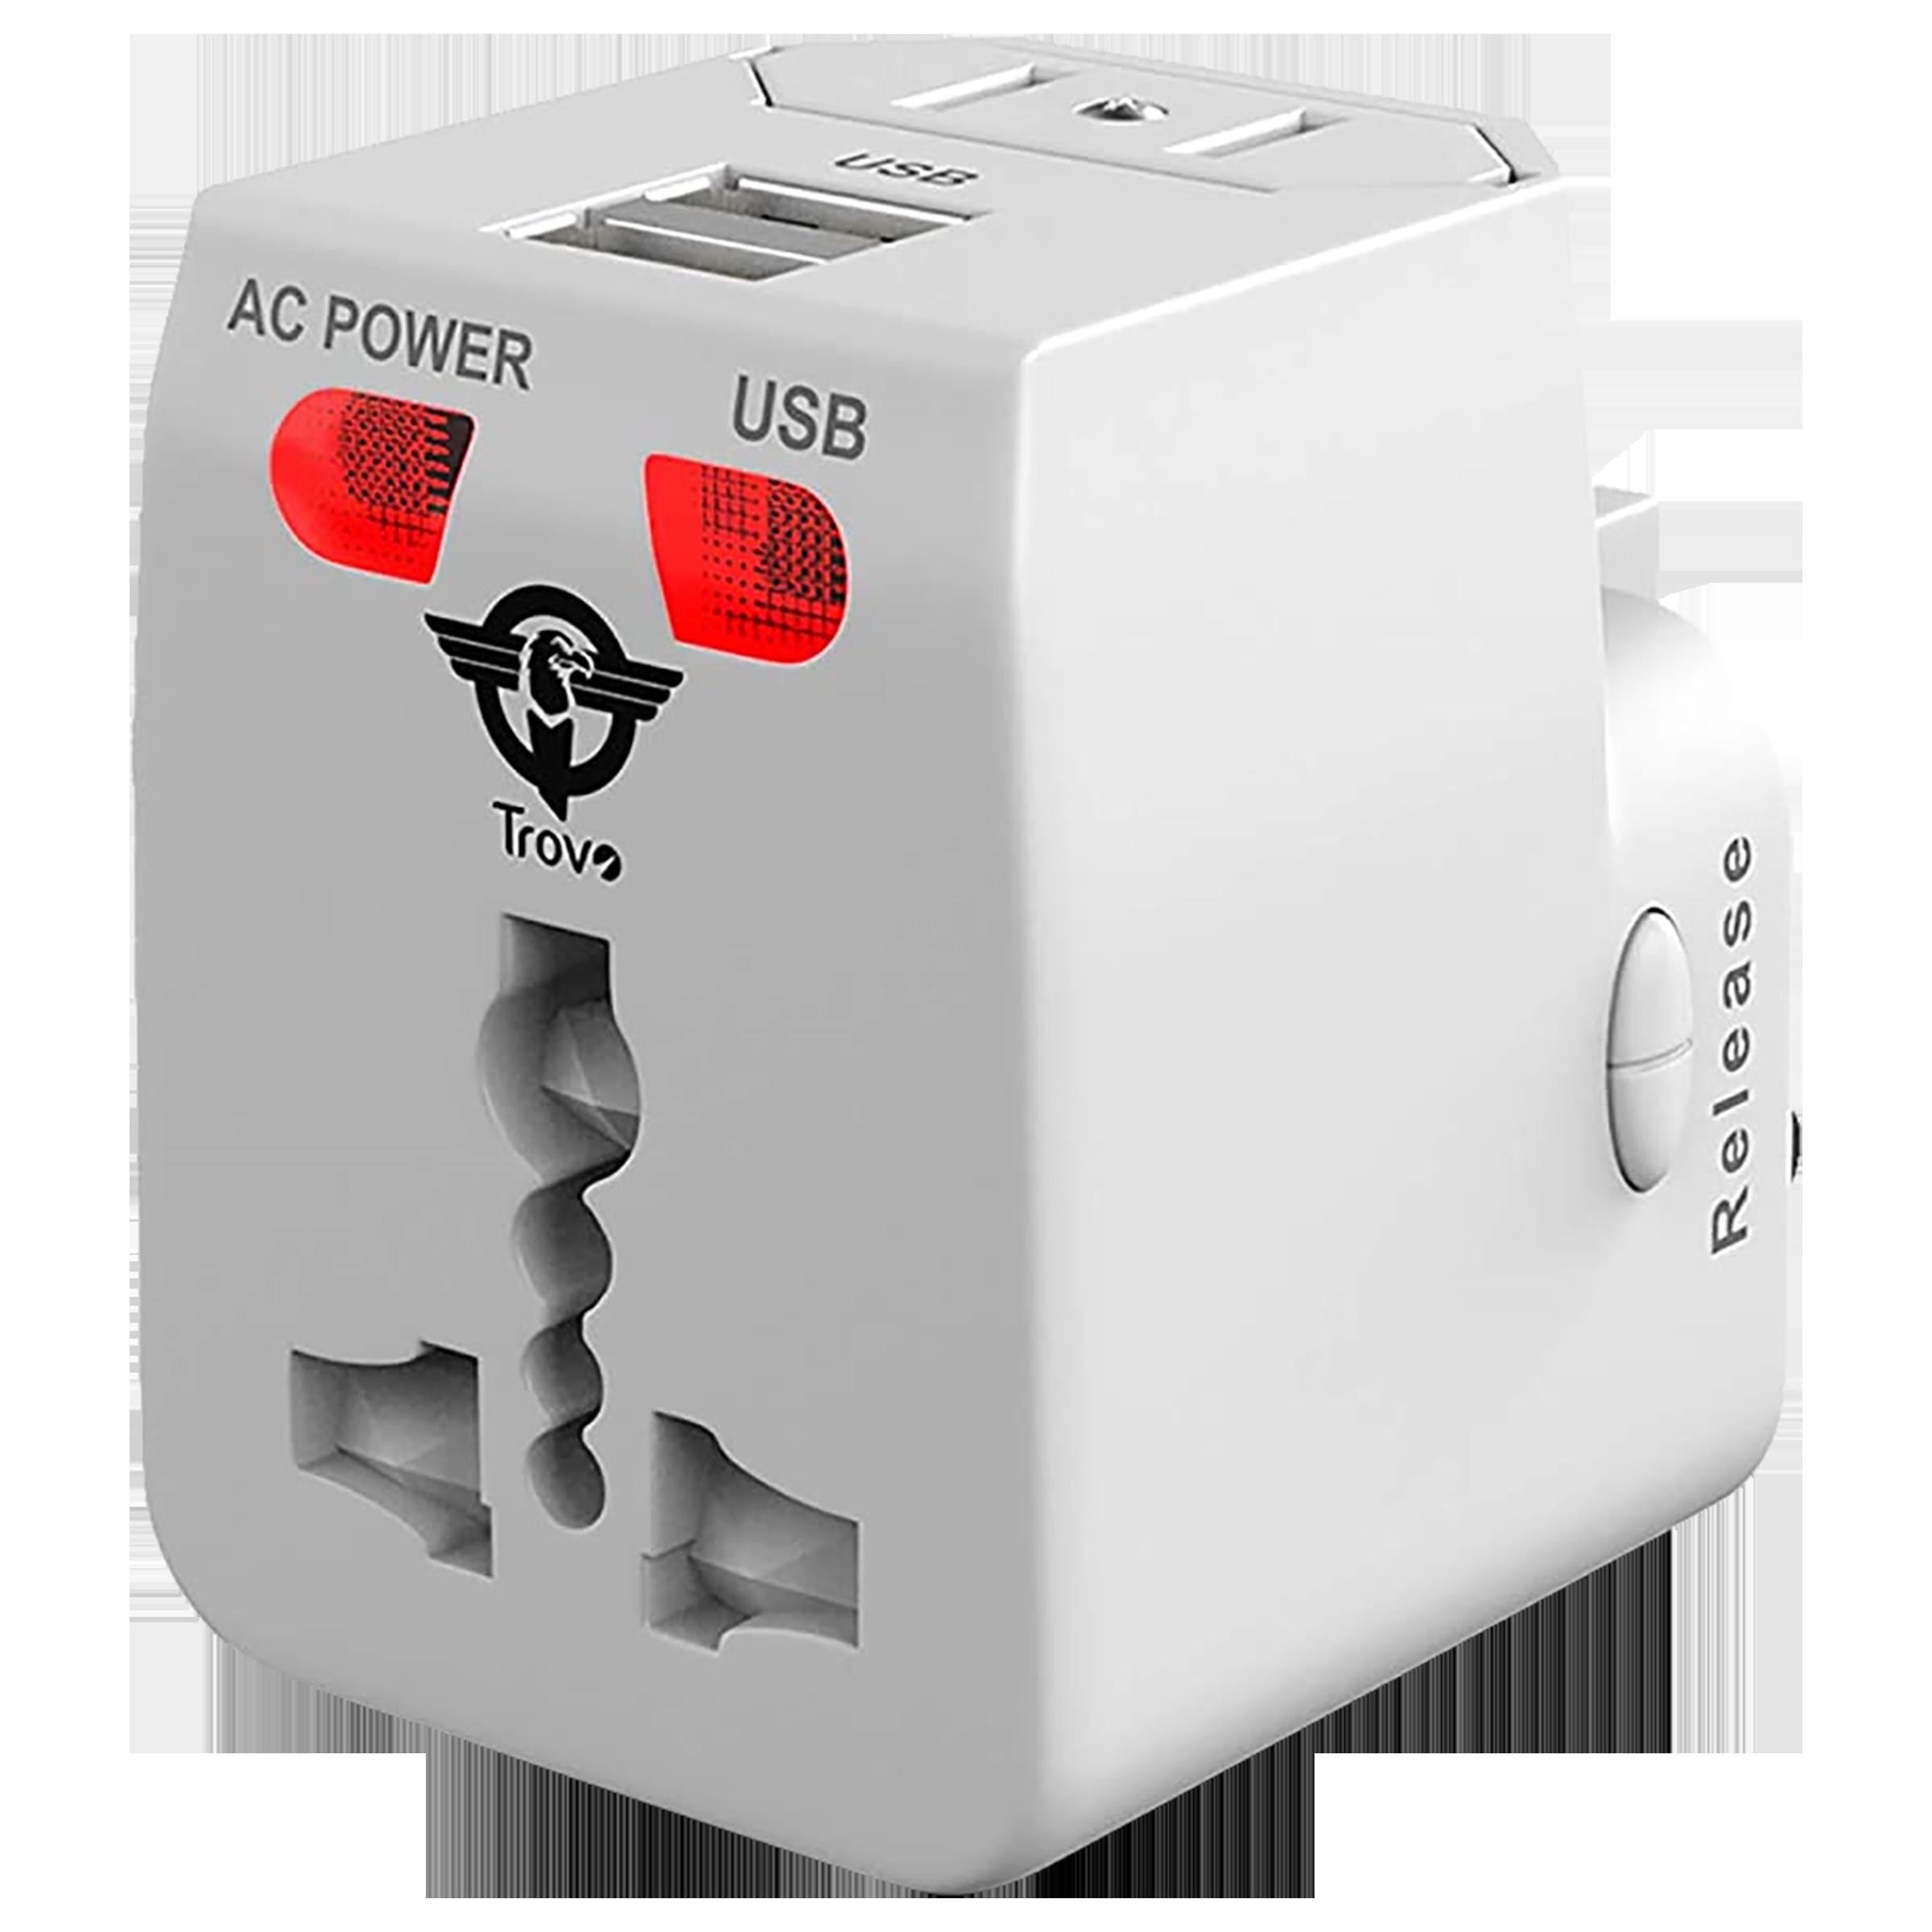 Trovo Plug Pack Lite 3 Plugs Adapter (Dual USB Ports, TTA-11, White)_1